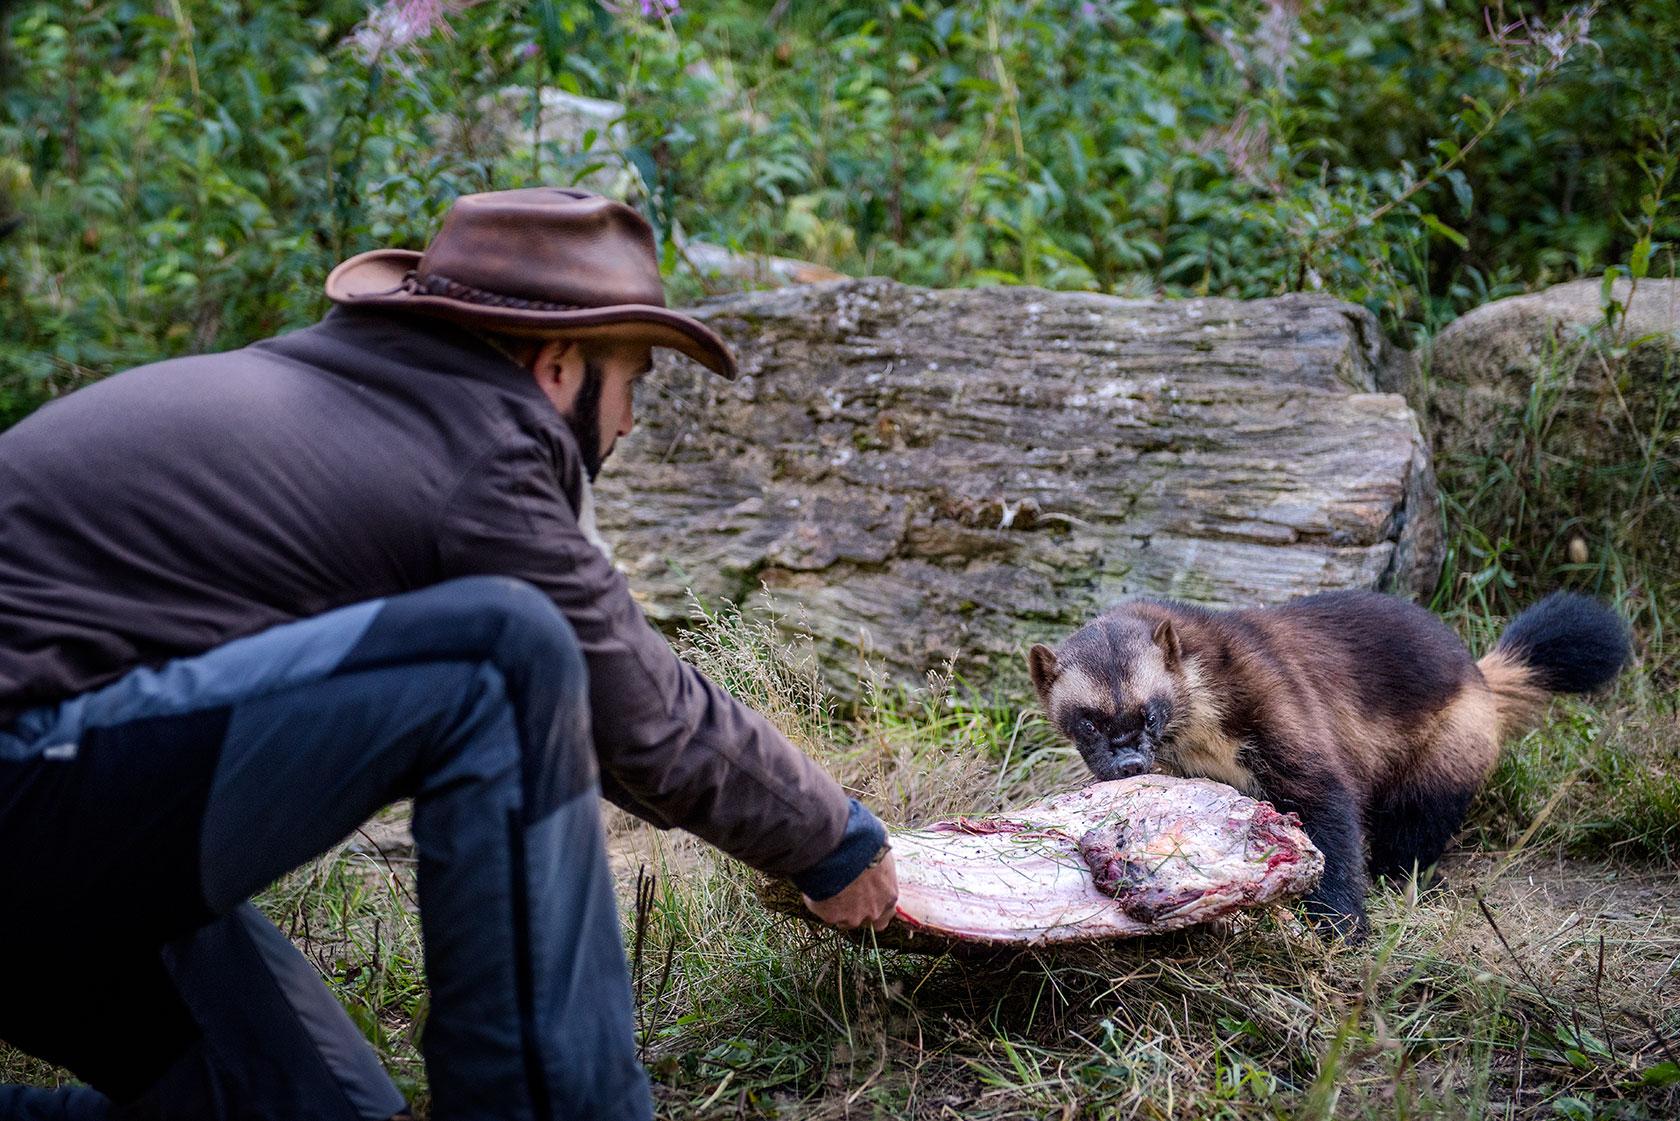 austin-trigg-brave-wilderness-alaska-BW-Coyote-Plays-TugOWar-DSC_5164-web.jpg